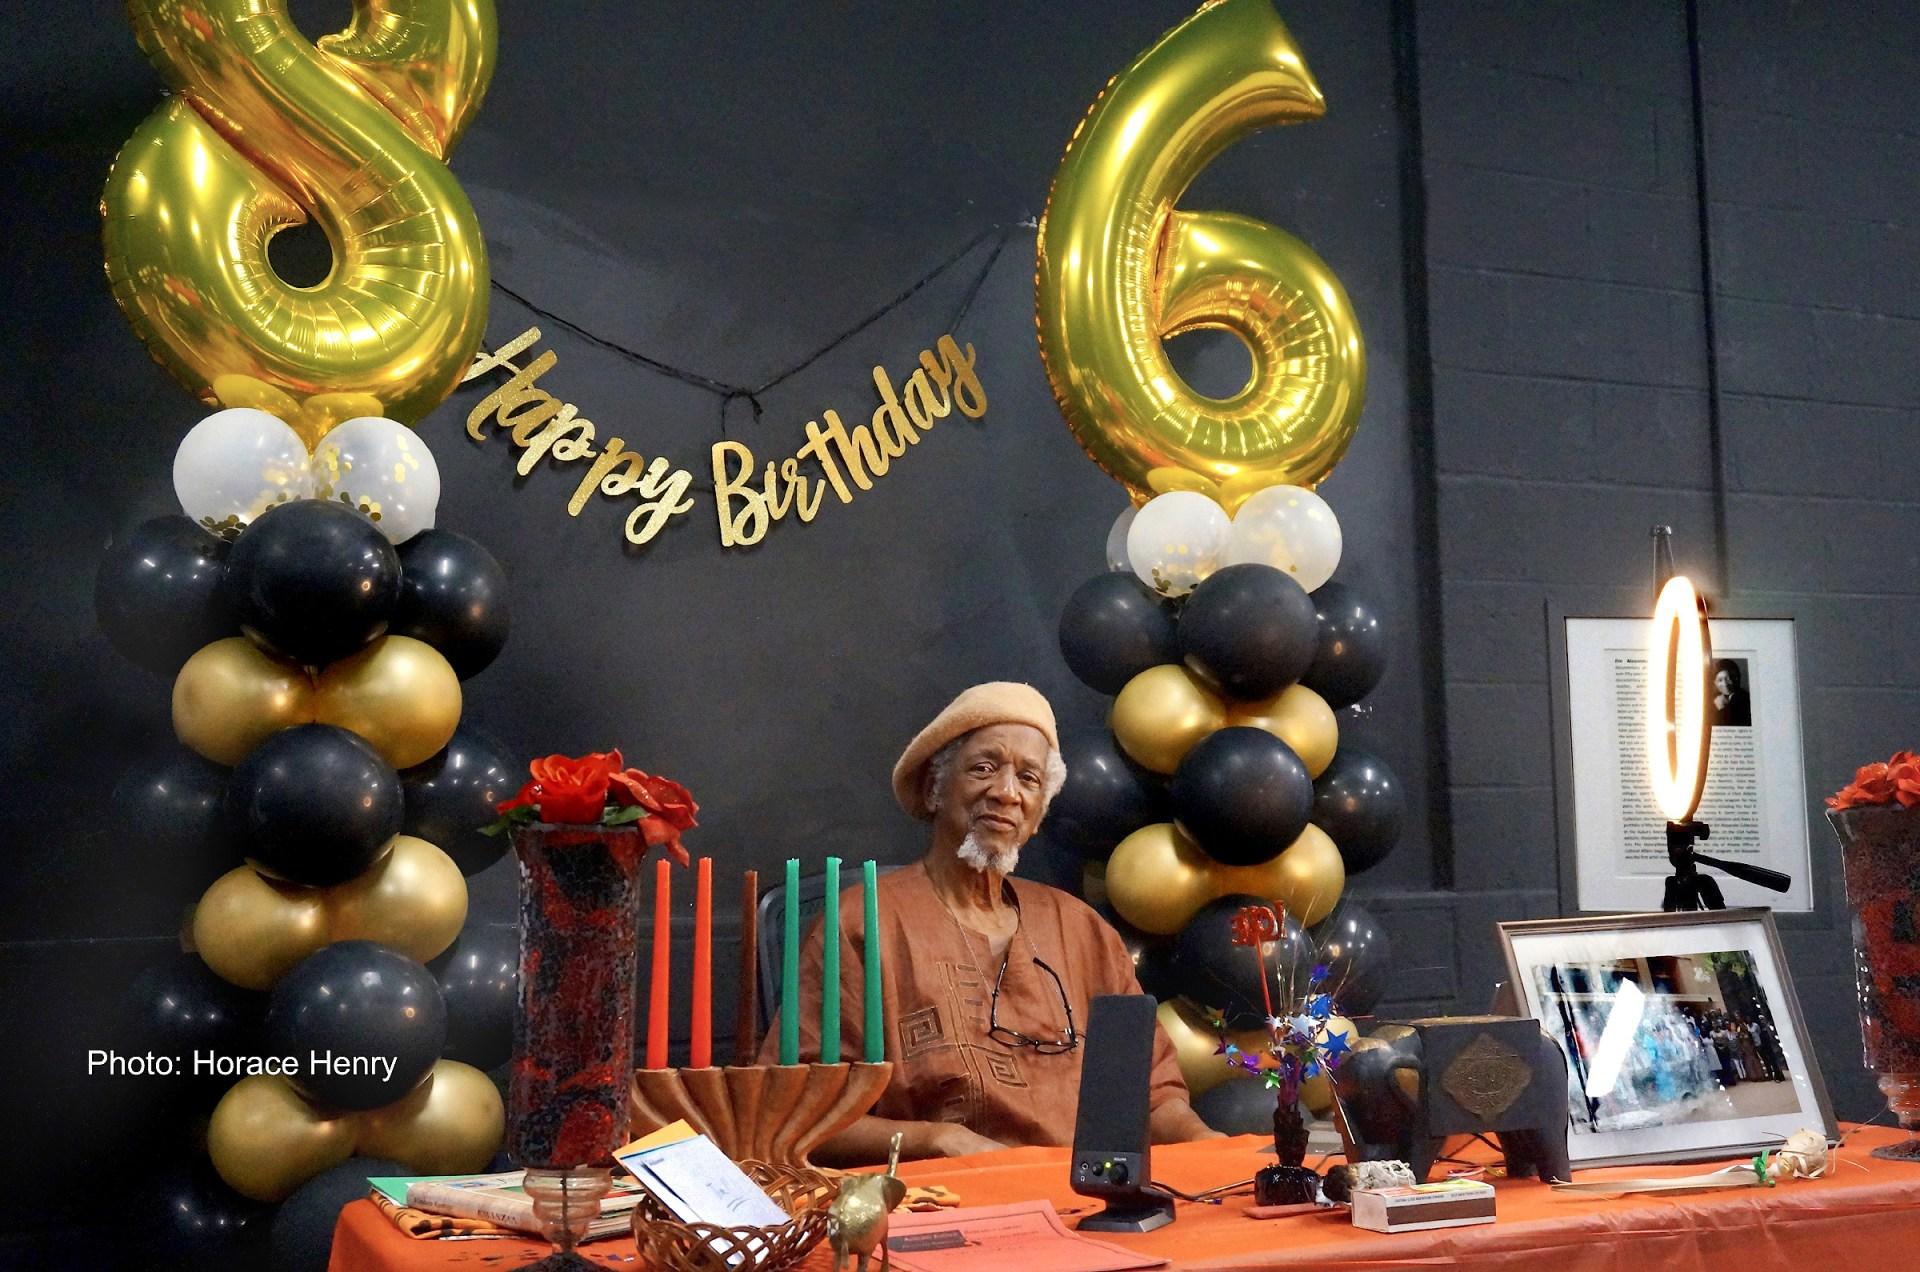 Atlanta Professional Photographer Jim Alexander at his 86th Birthday Celebration. Photo By Horace Henry